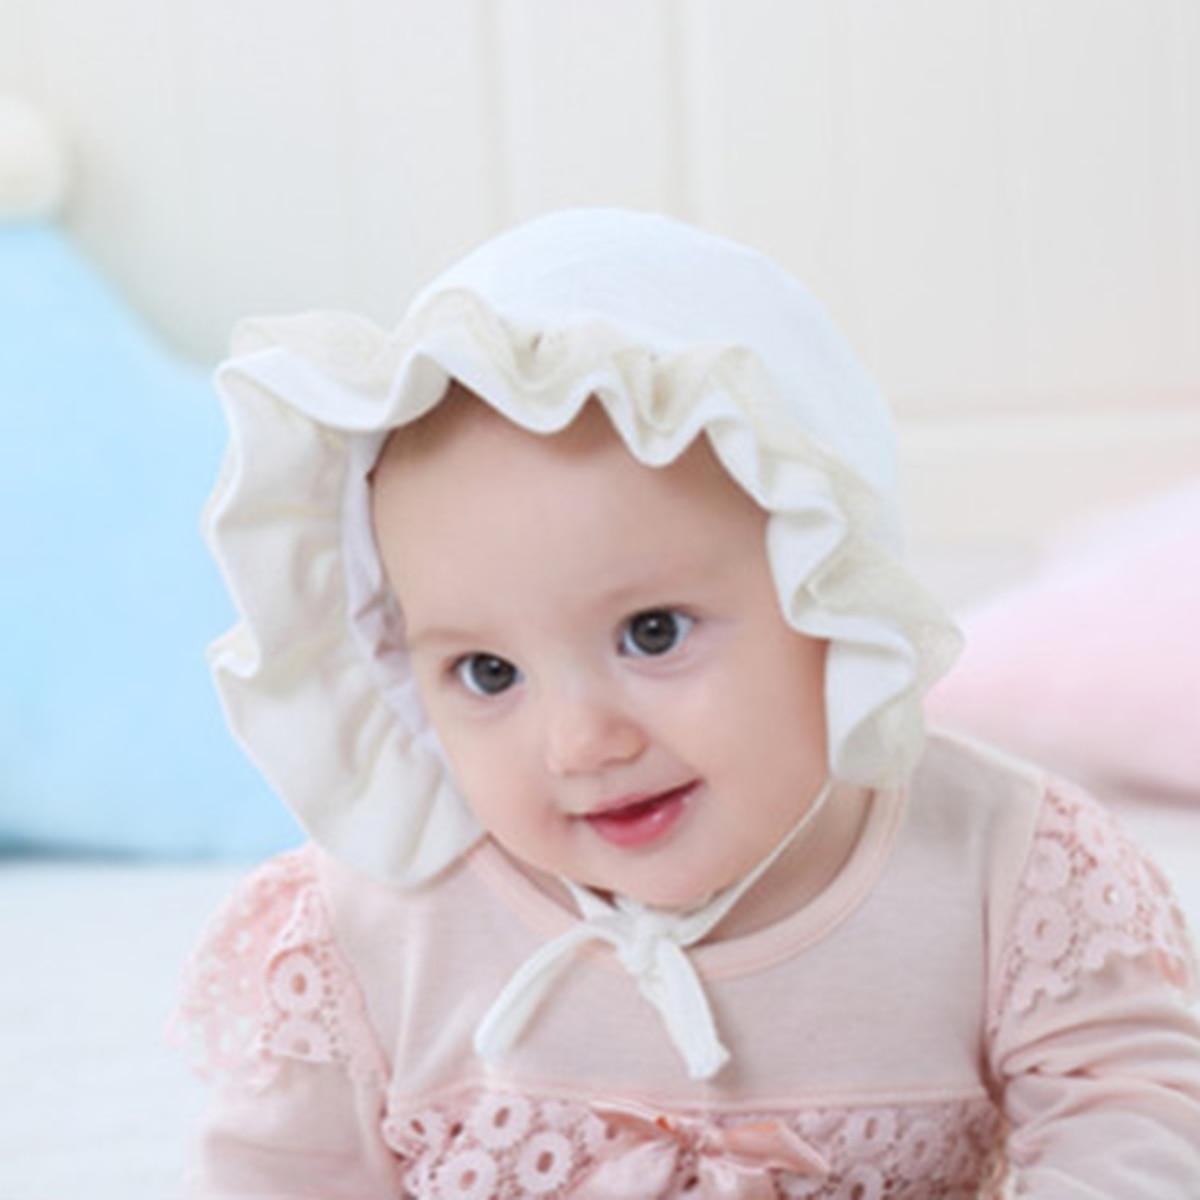 Baby Cap Newborn Girl Cute Cotton Hat Lace Pink Soft White Adjustable Princess